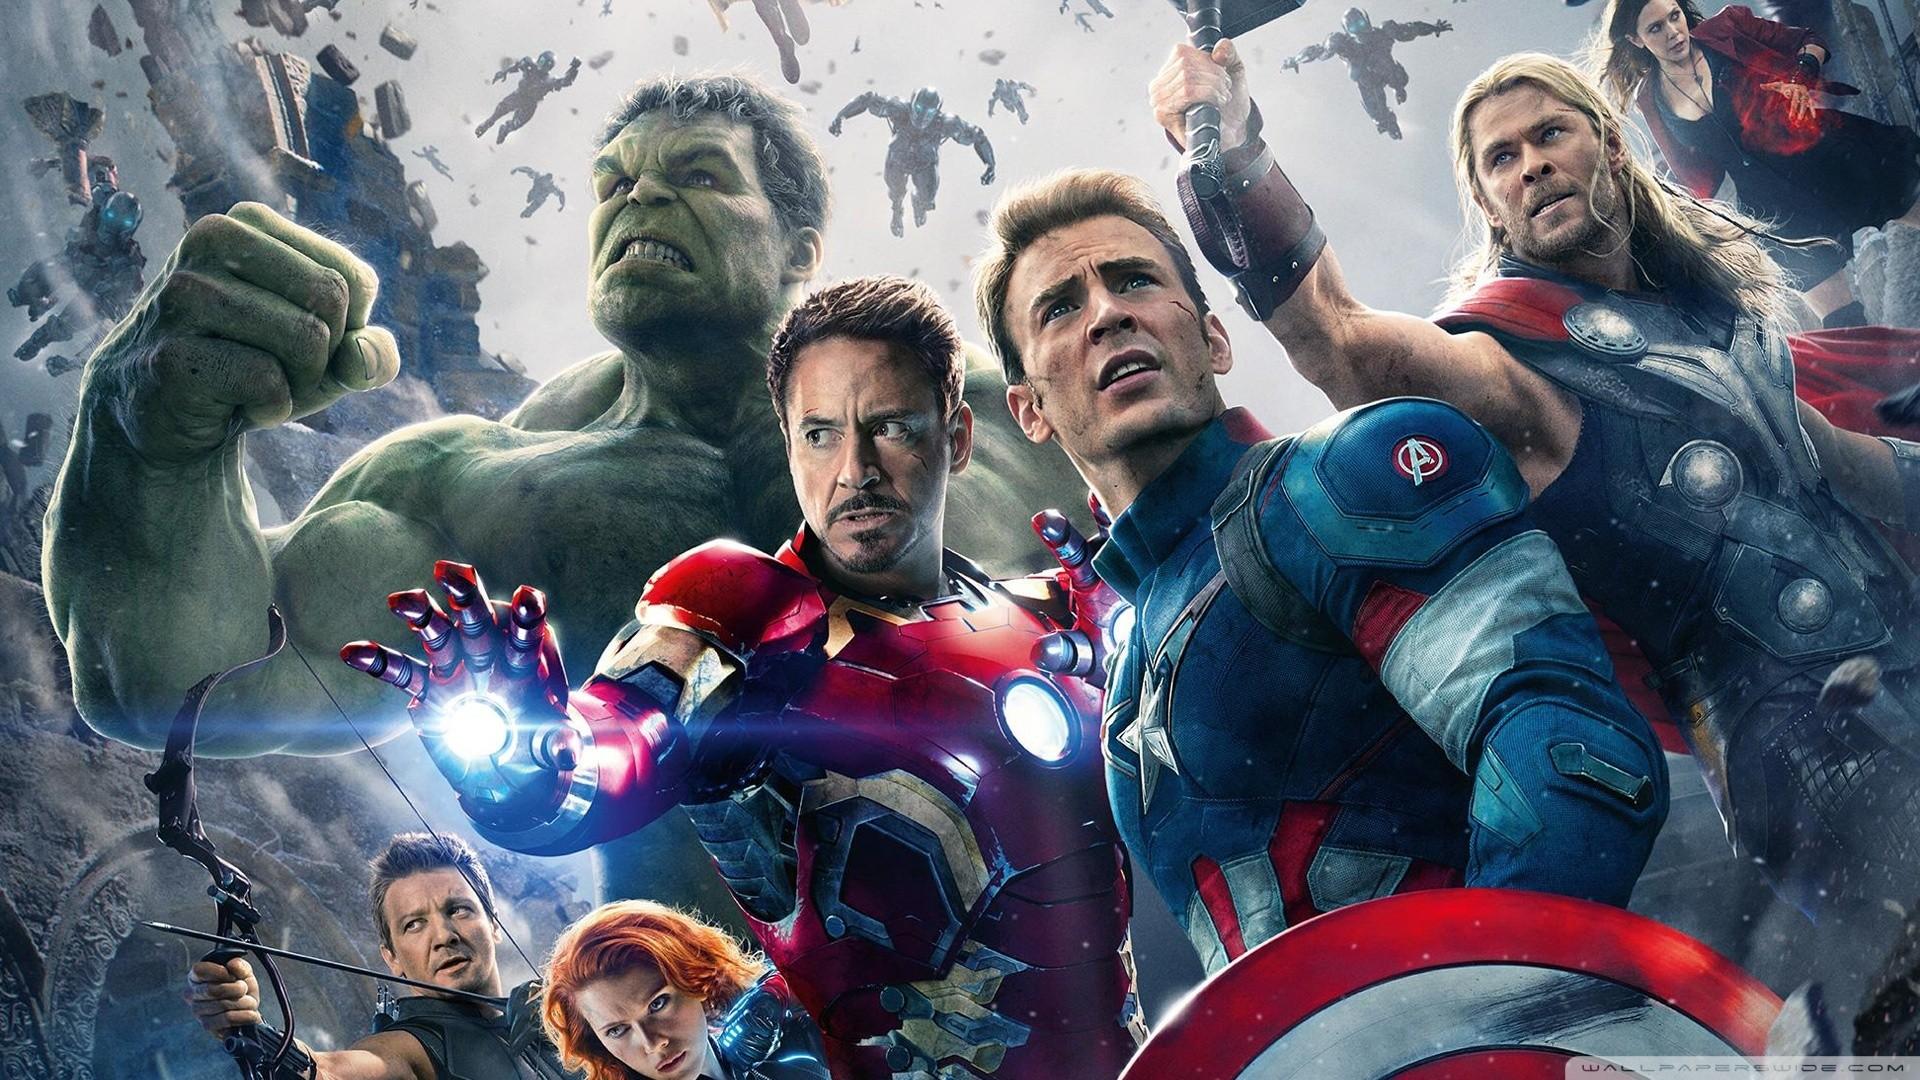 ماروِل عزیز!ممنون بابت همه چیز (Avengers : Endgame)